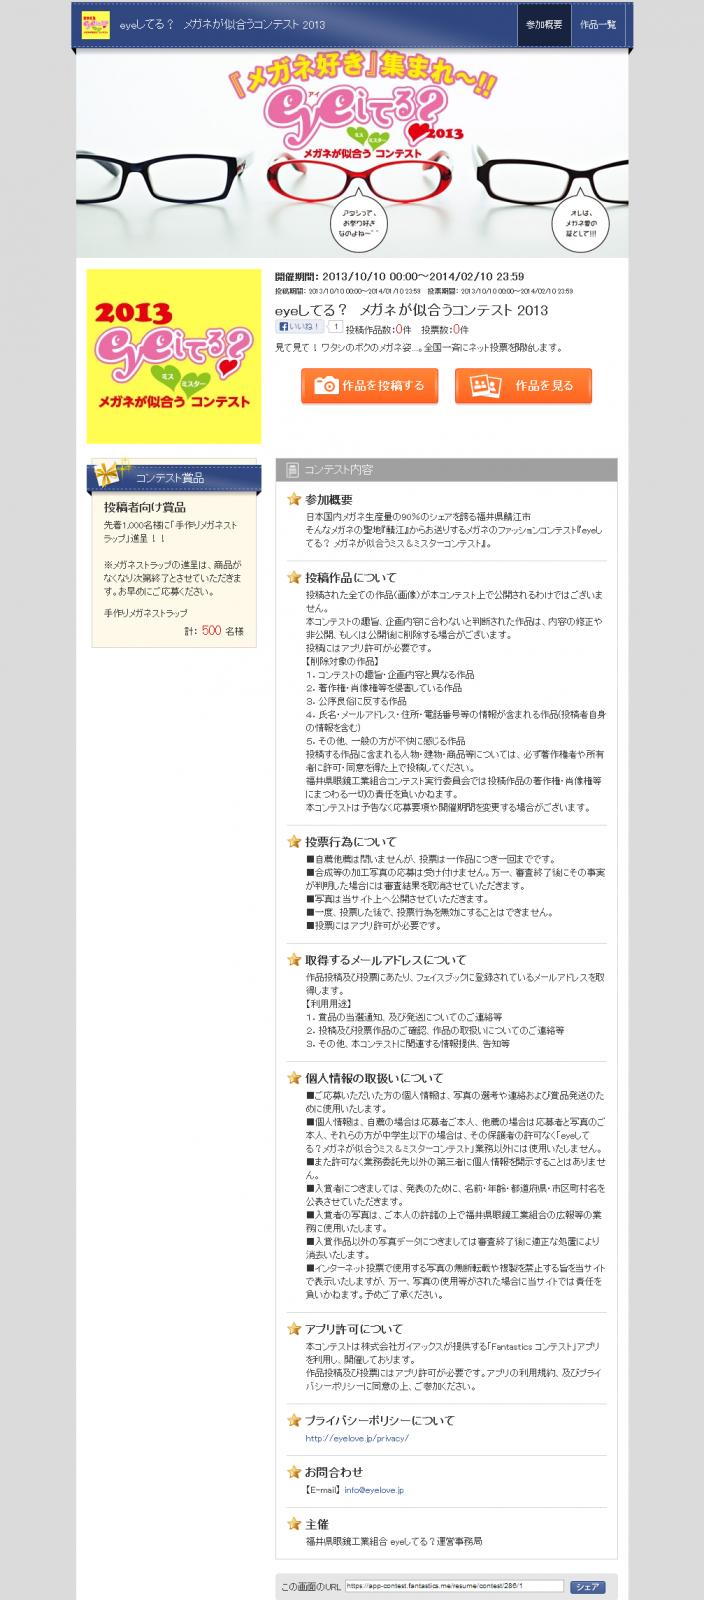 Fantastics 投稿&投票コンテスト(福井県眼鏡工業青年部PR委員会様)